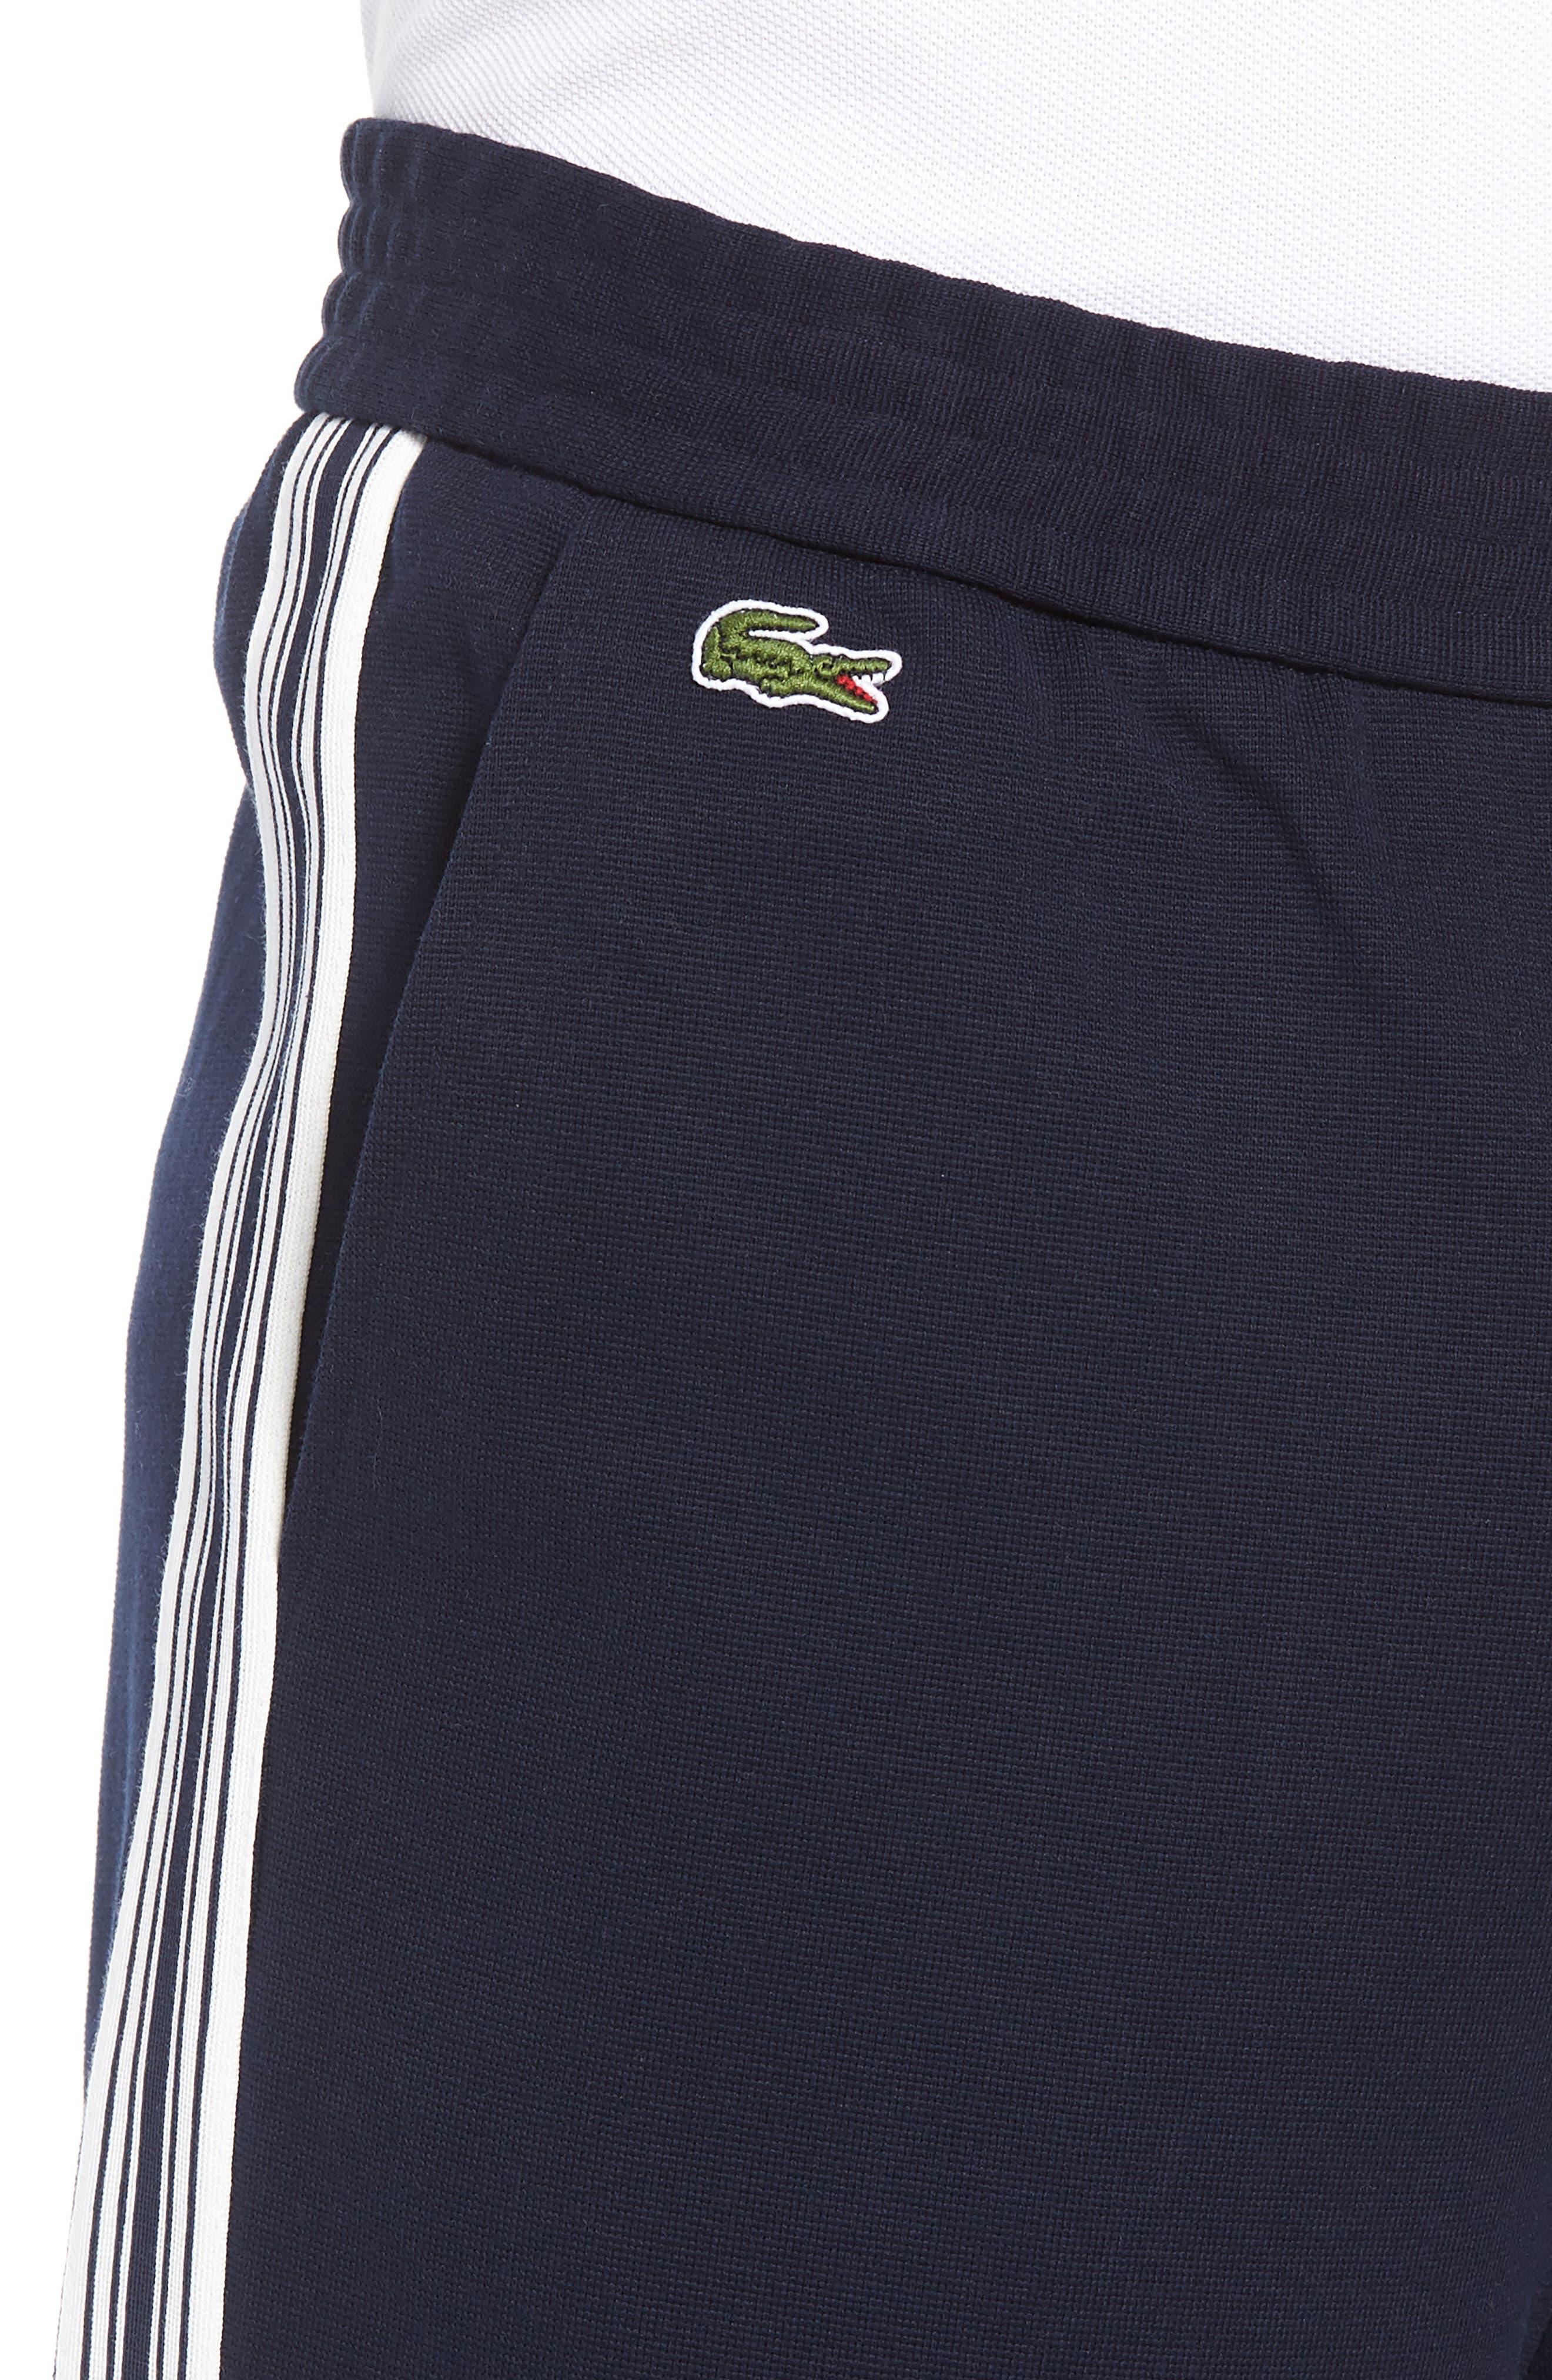 Alternate Image 4  - Lacoste Milano Jogger Pants